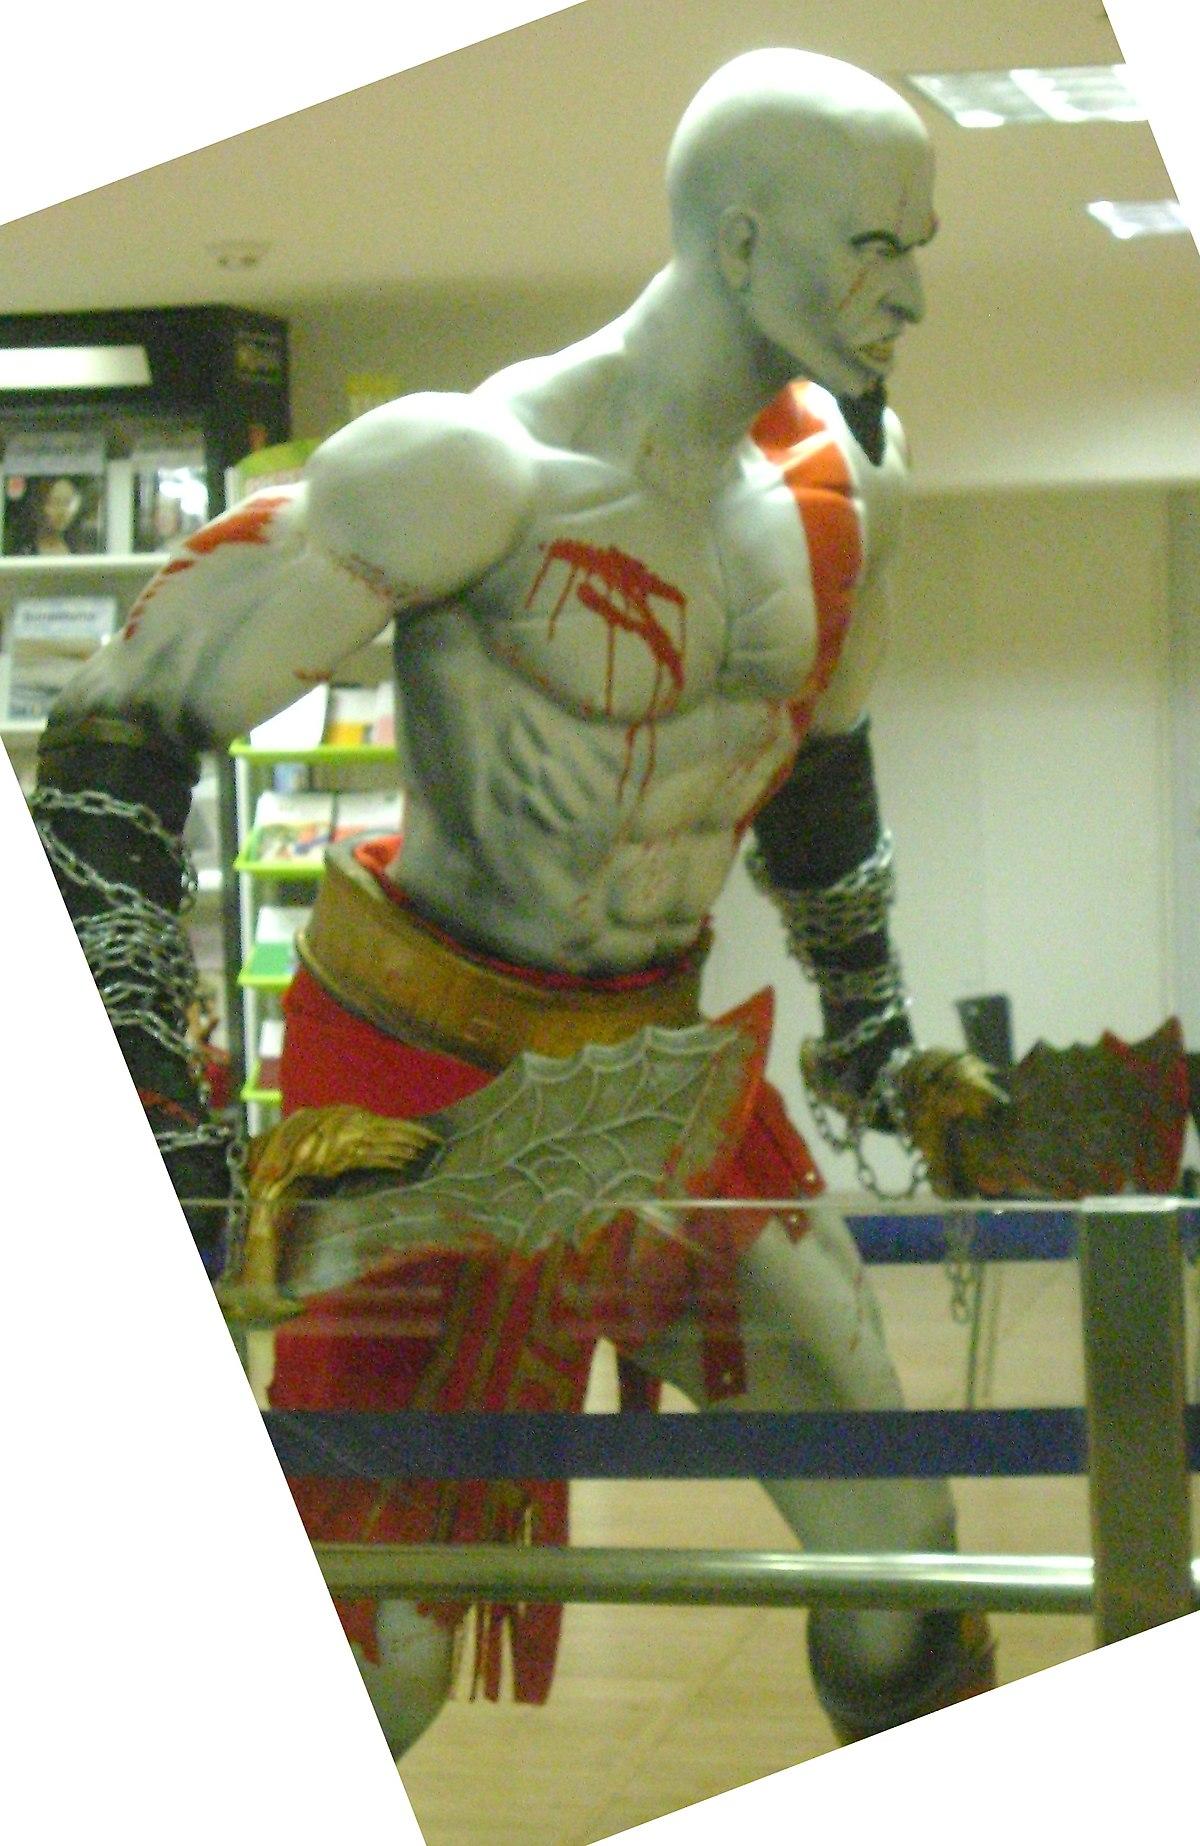 Kratos (personaje) - Wikipedia, la enciclopedia libre